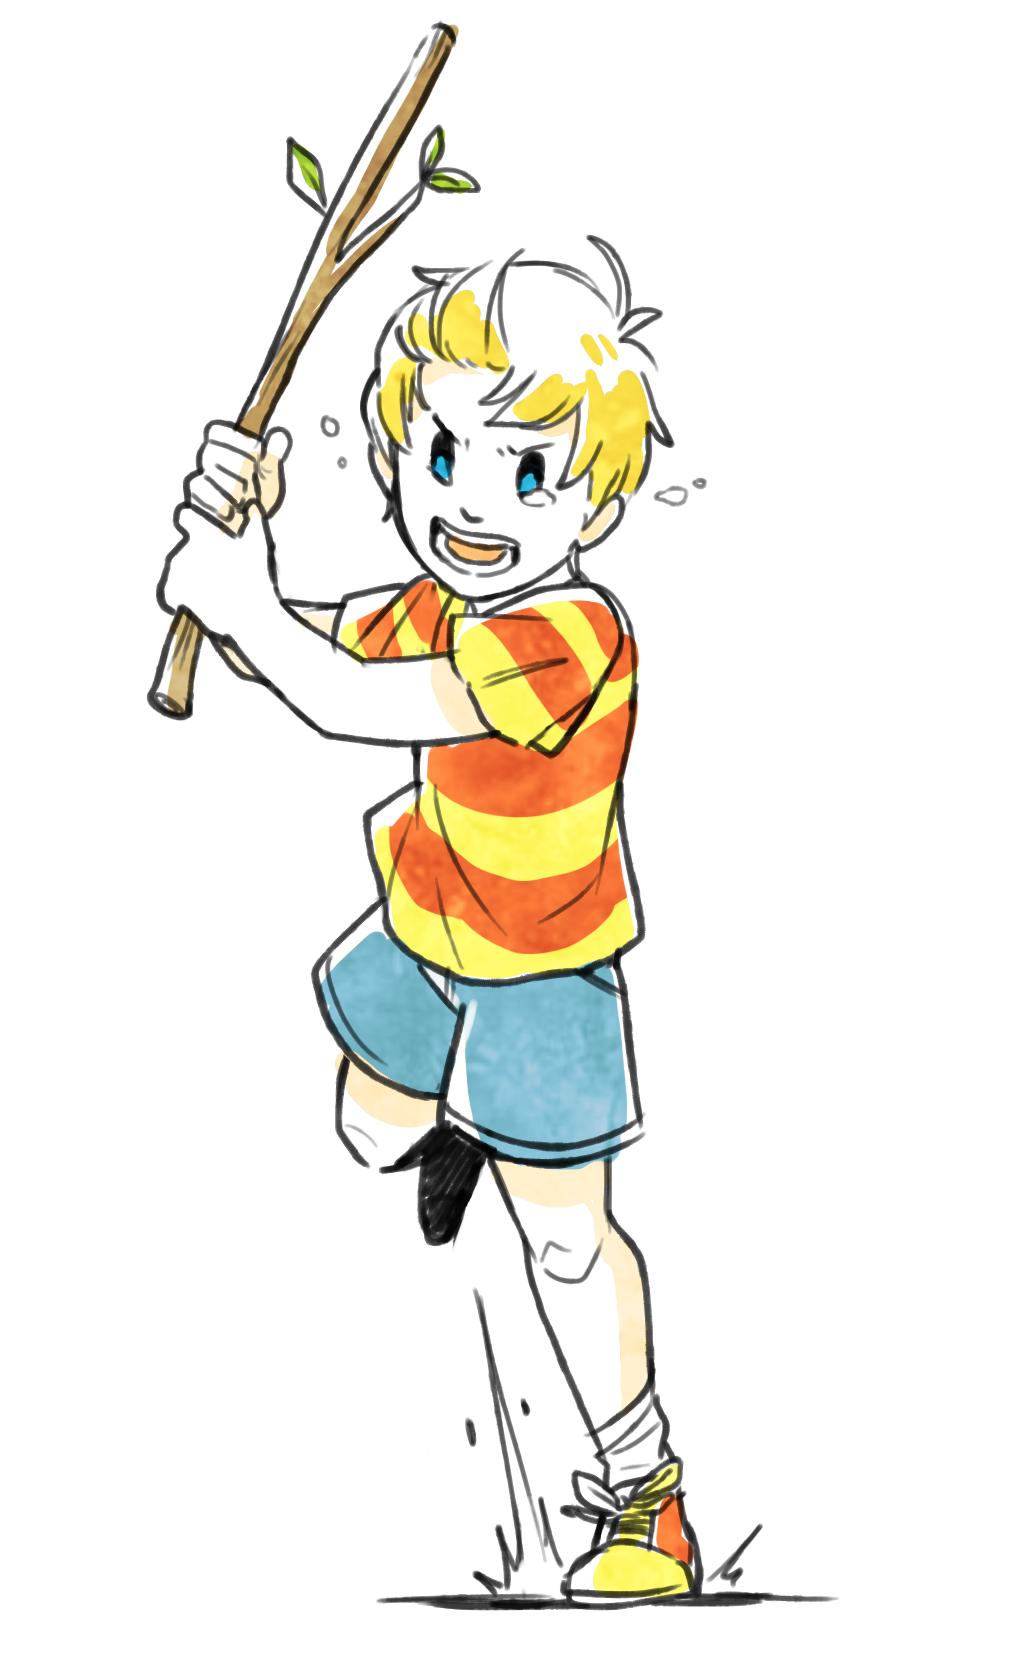 Lucas Mother 3 by scribblecee | Gaming | Lucas mother 3, Lucas